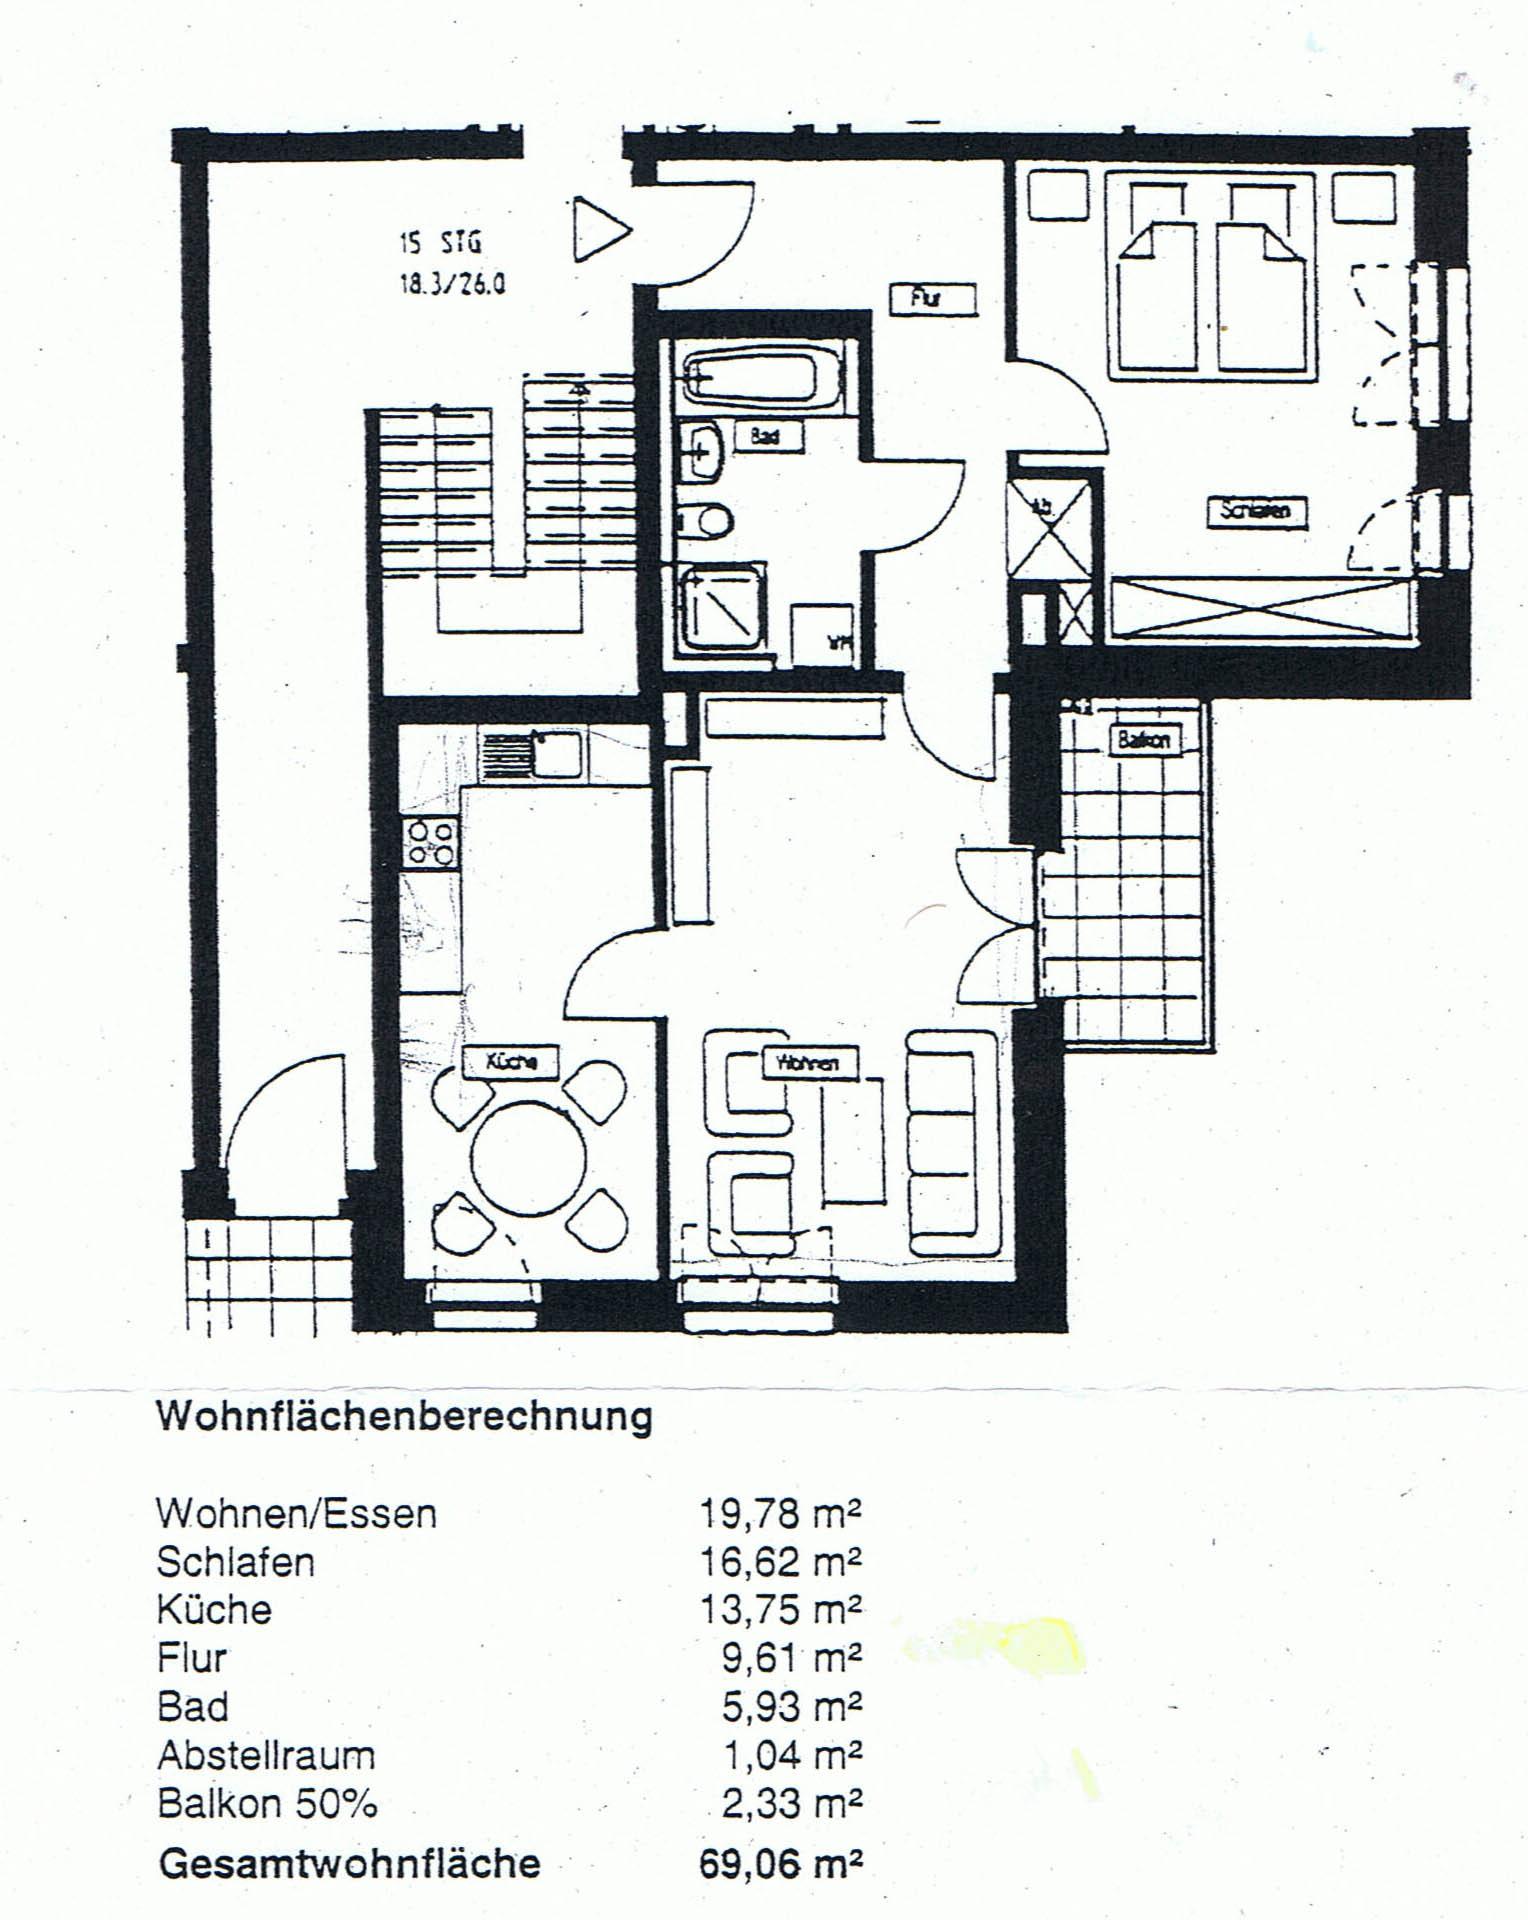 68 qm hans jansen immobilien marketing. Black Bedroom Furniture Sets. Home Design Ideas